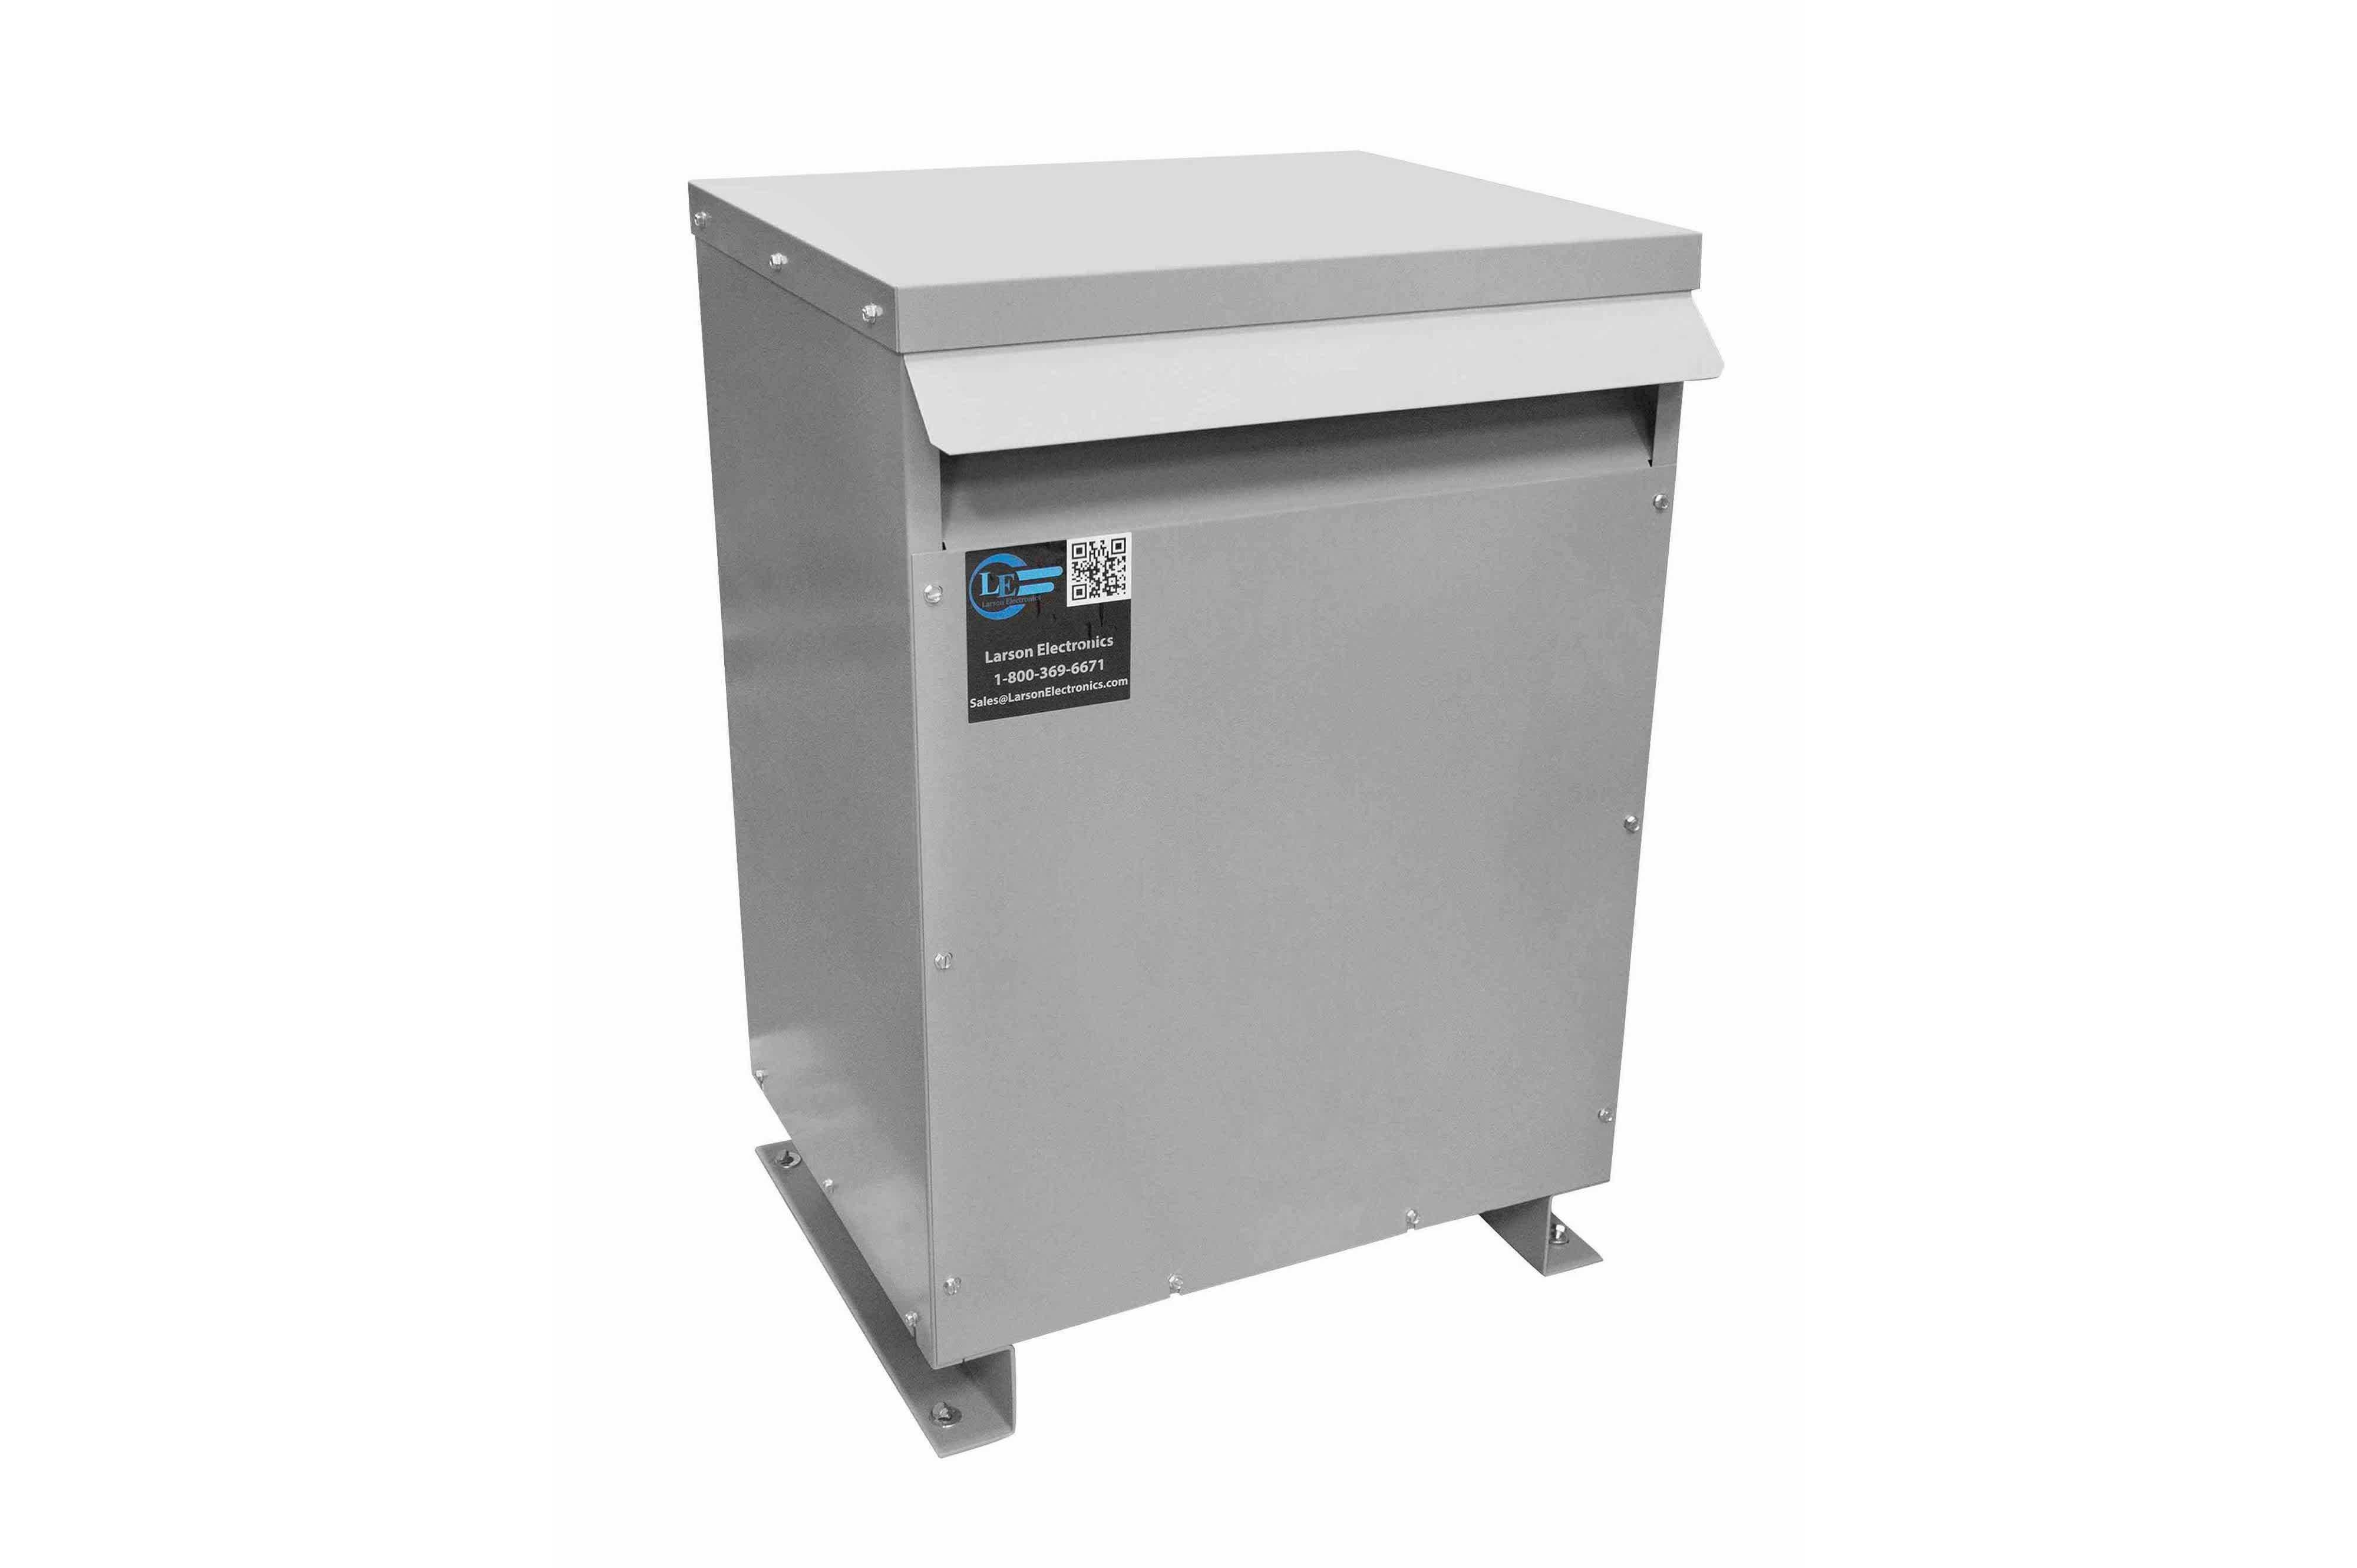 400 kVA 3PH DOE Transformer, 240V Delta Primary, 480Y/277 Wye-N Secondary, N3R, Ventilated, 60 Hz